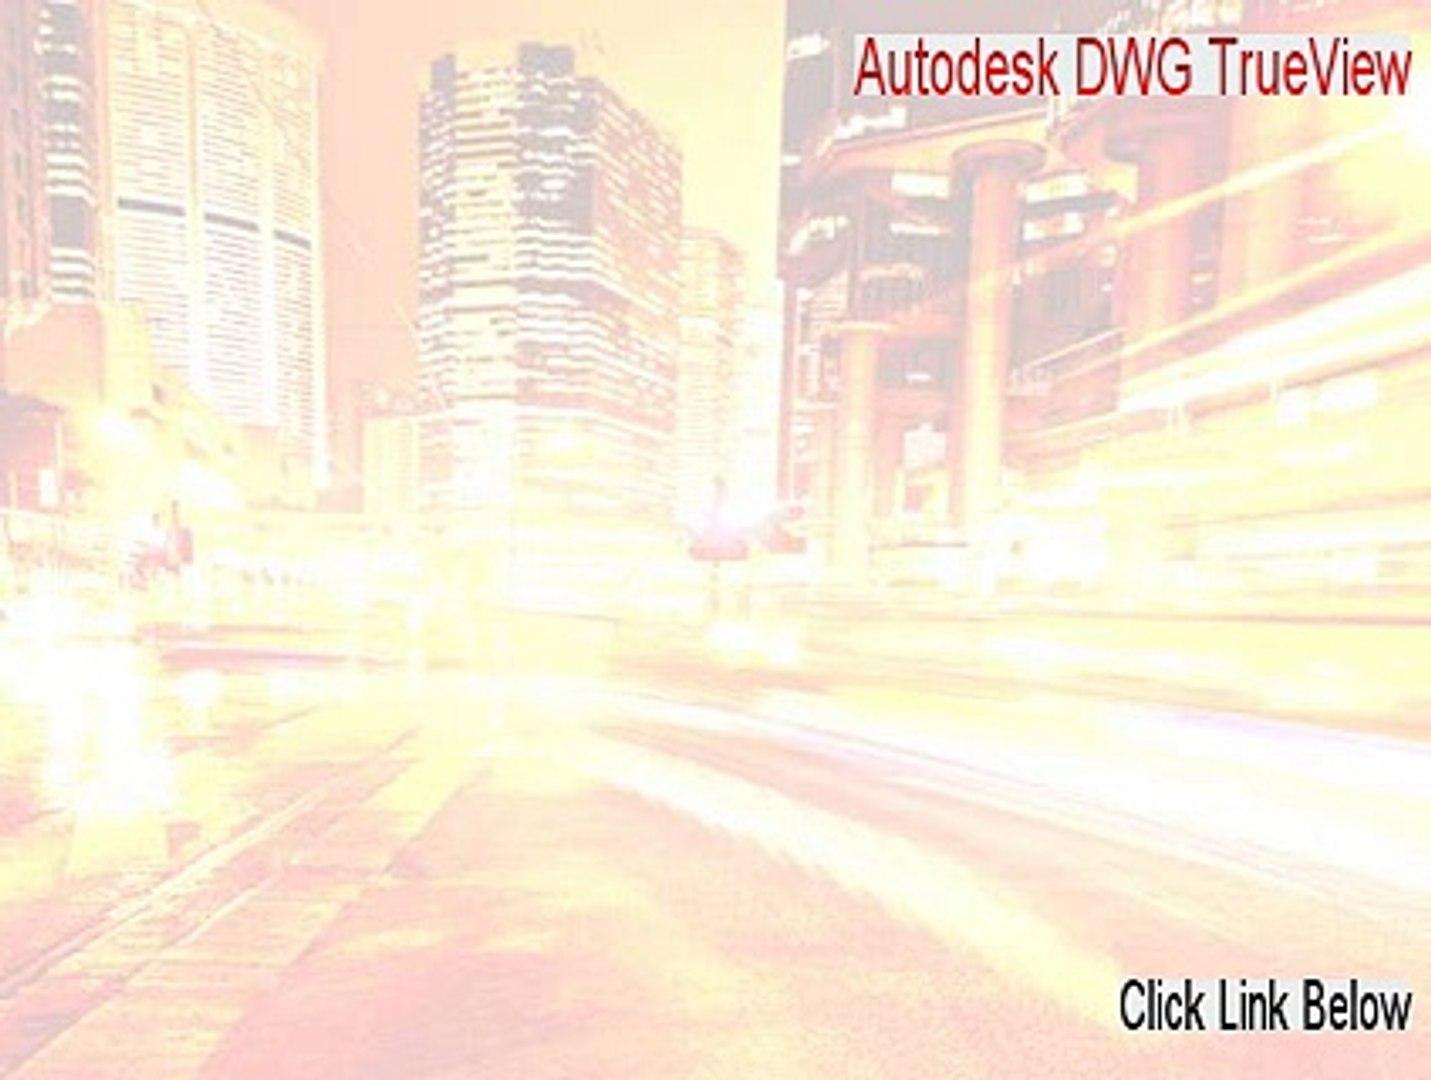 Autodesk DWG TrueView Keygen (autodesk dwg trueview 2015 tutorial 2015)